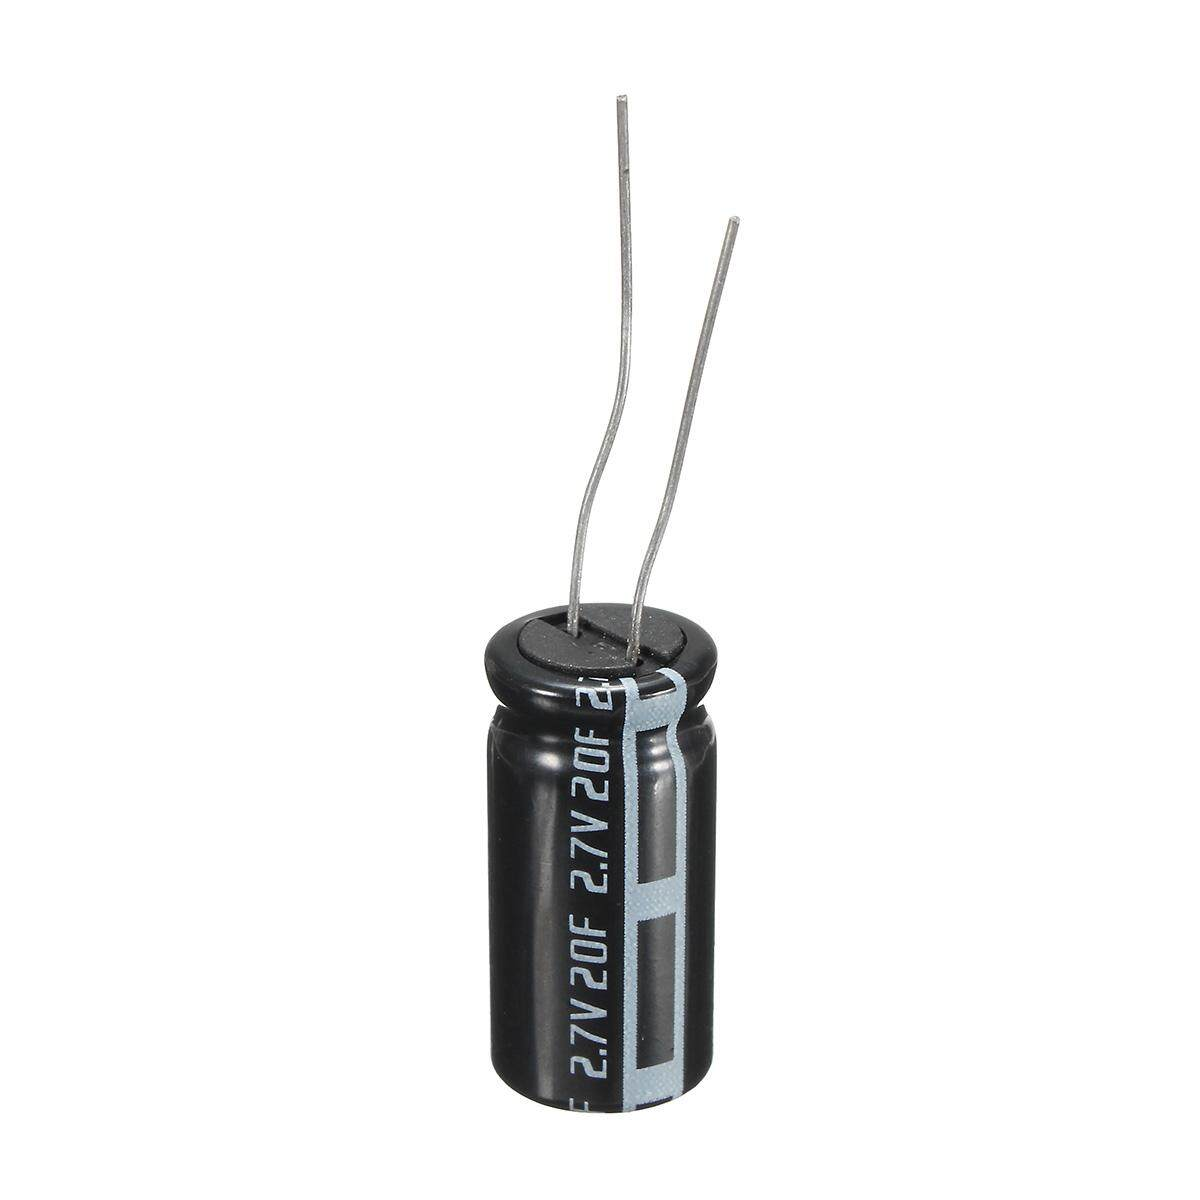 Jual Kapasitor Terbaik Termurah Audio 1 Pcs 27 V 20 Farad Silinder Super Ultra Daya Tinggi Supercap Intl